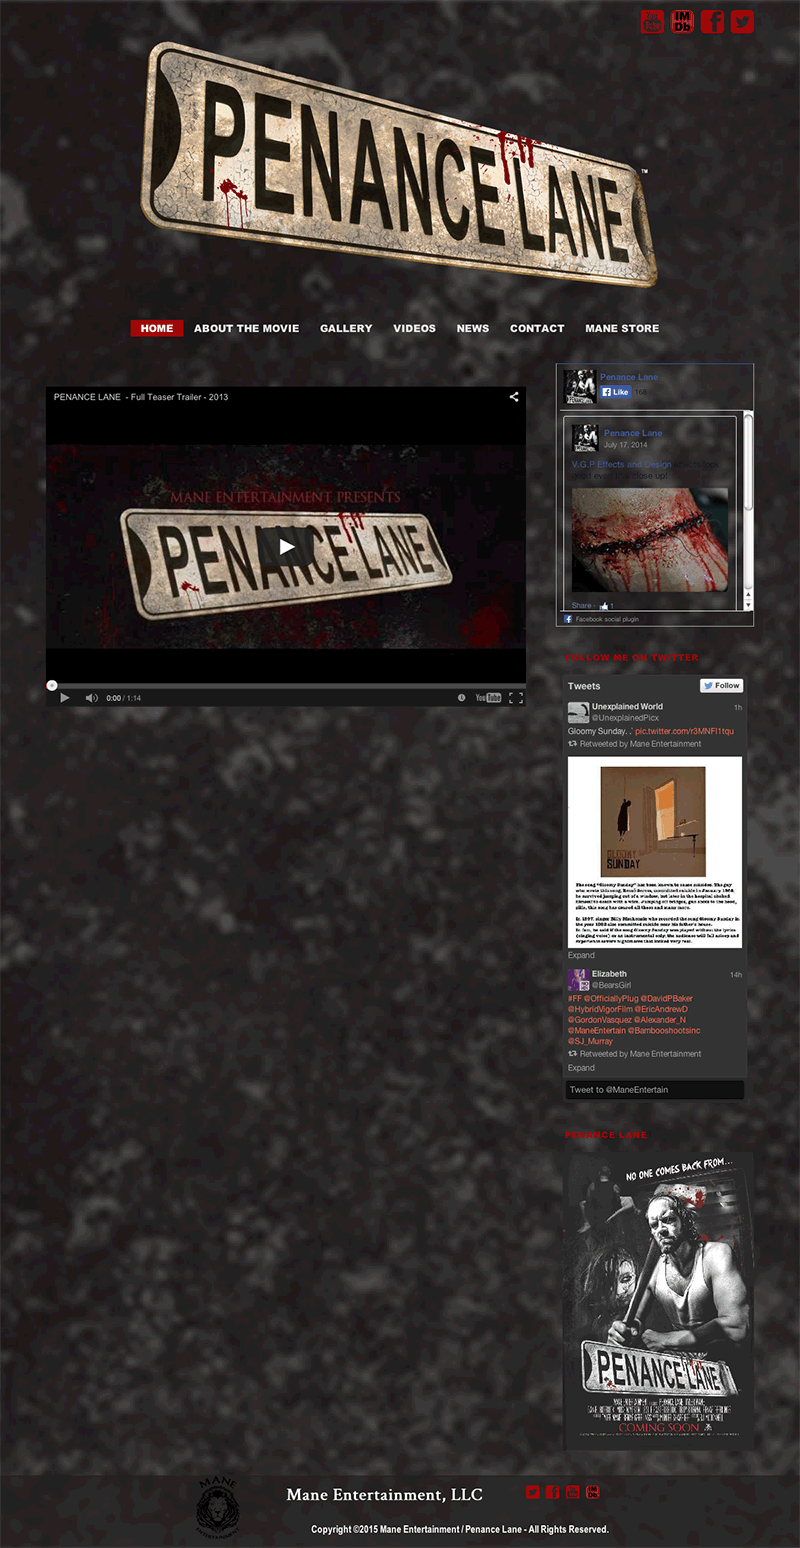 Penance Lane Home page